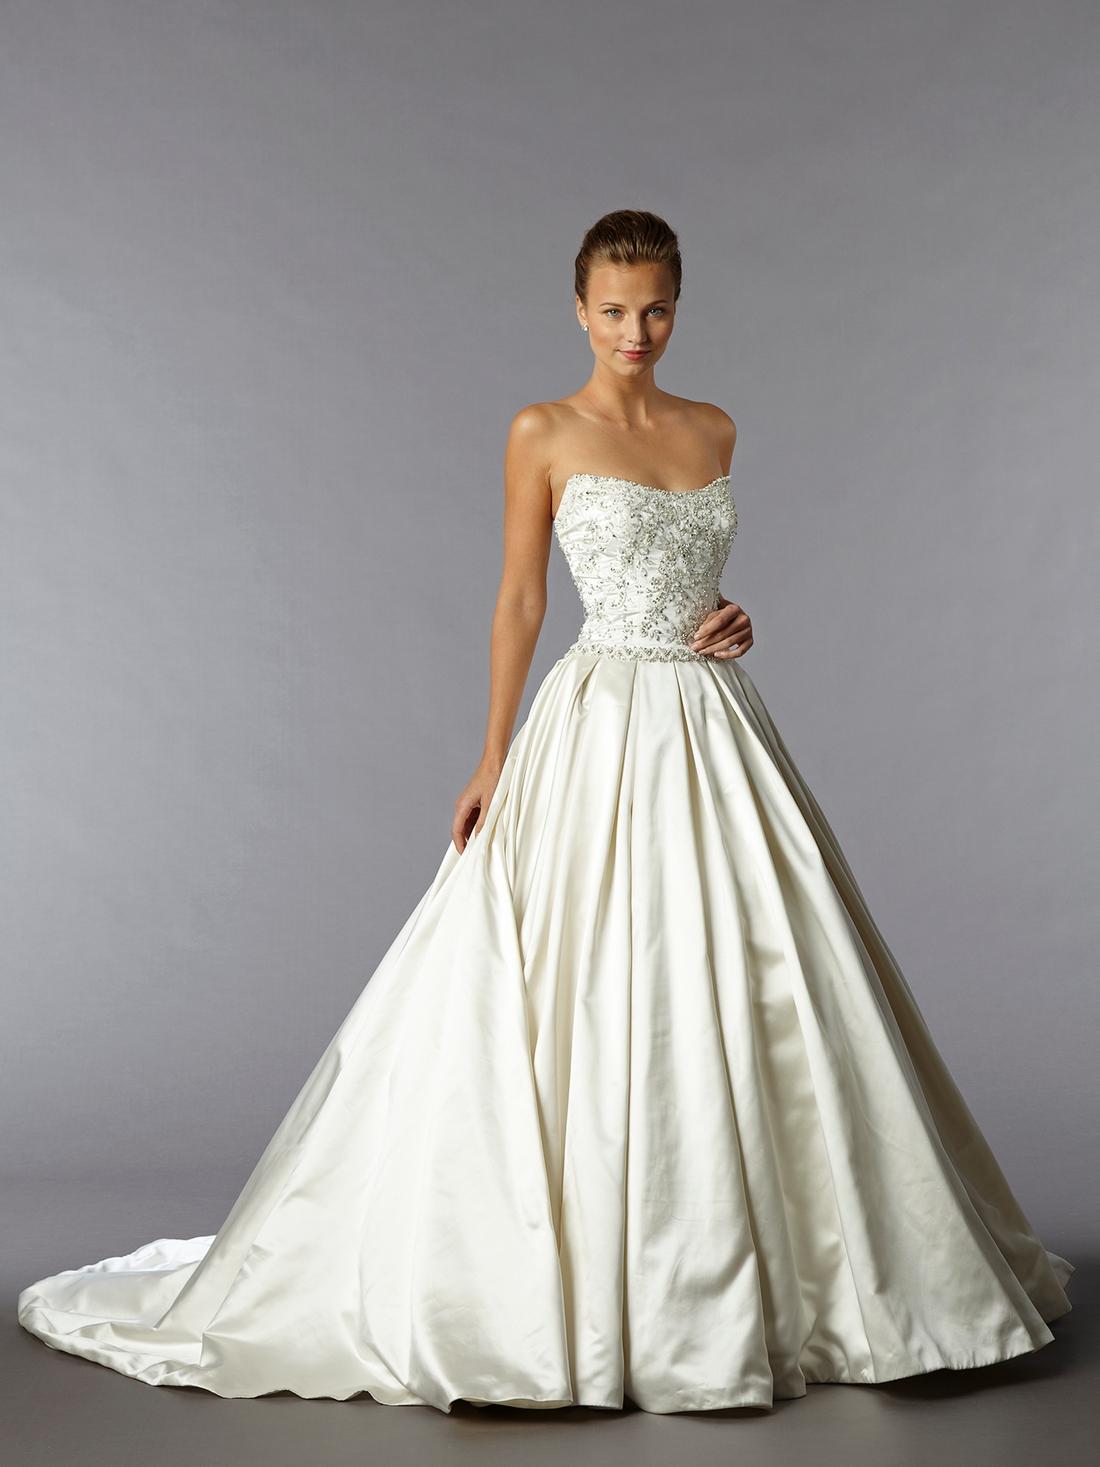 kleinfelds wedding dresses photo - 1